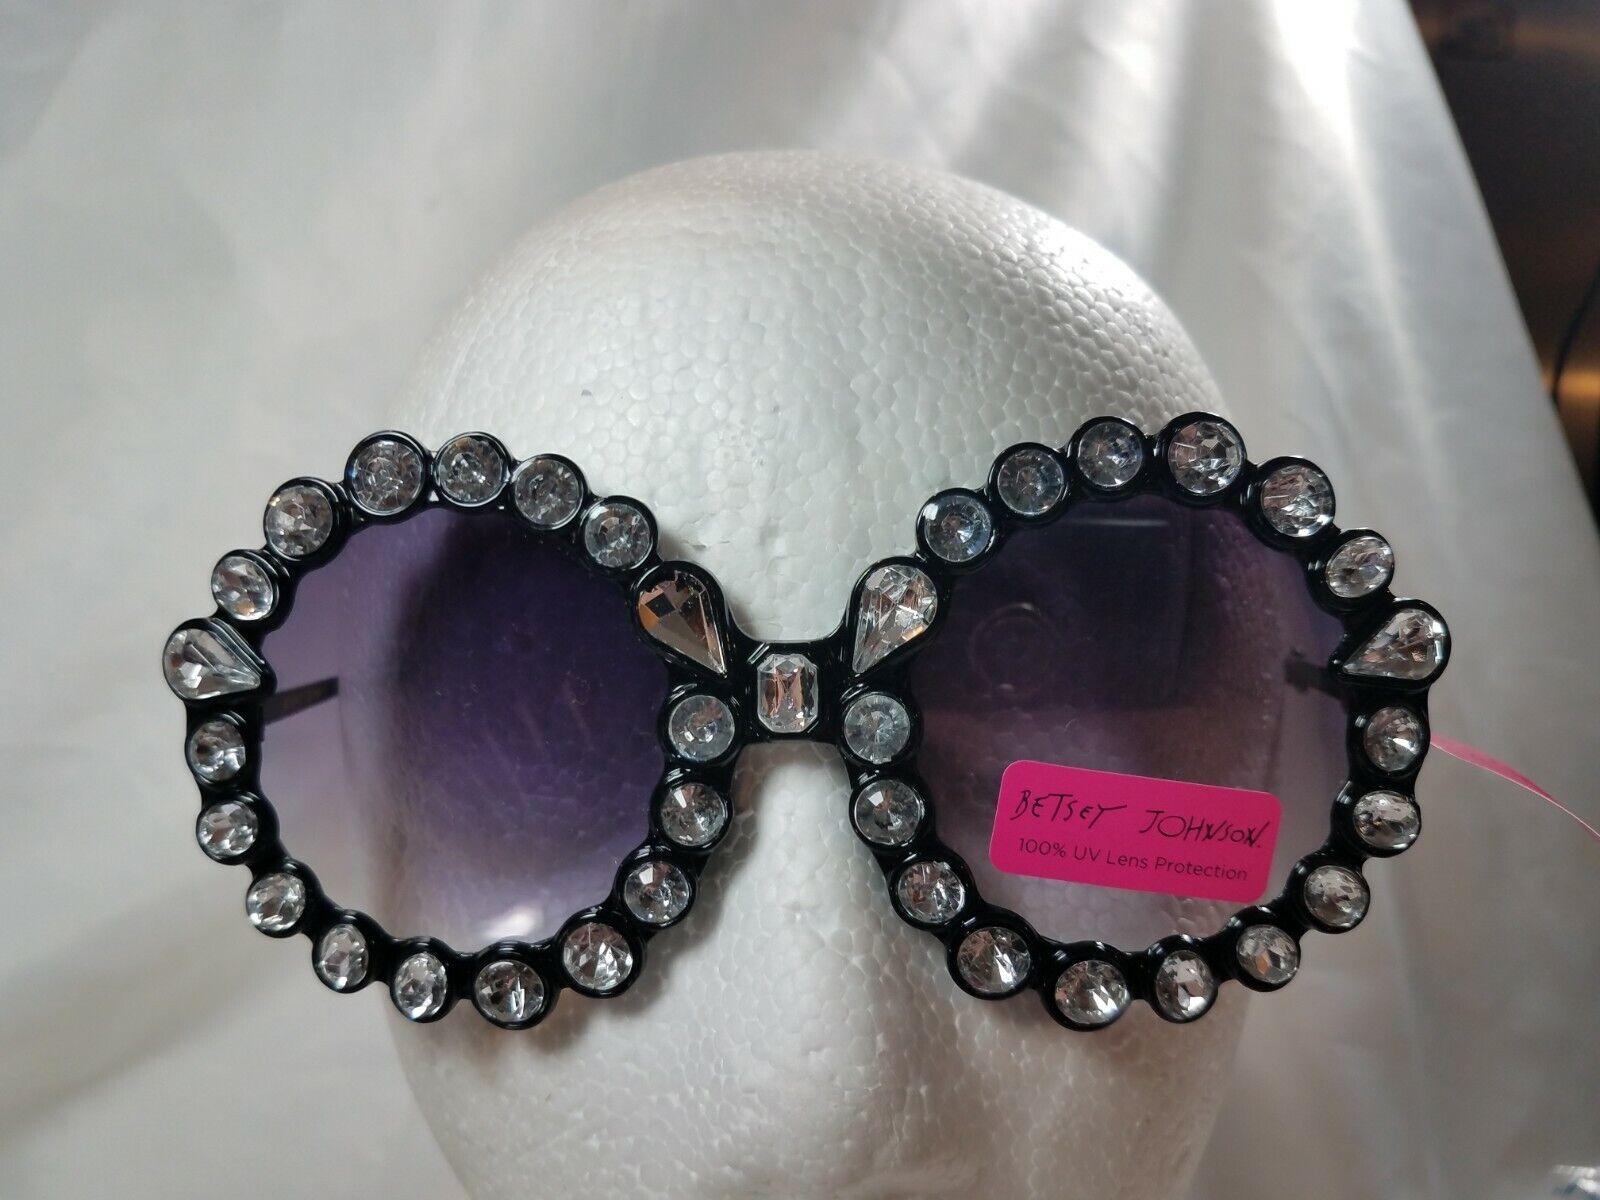 NWT Betsey Johnson oversized Round Sunglasses with Black Rhinestones